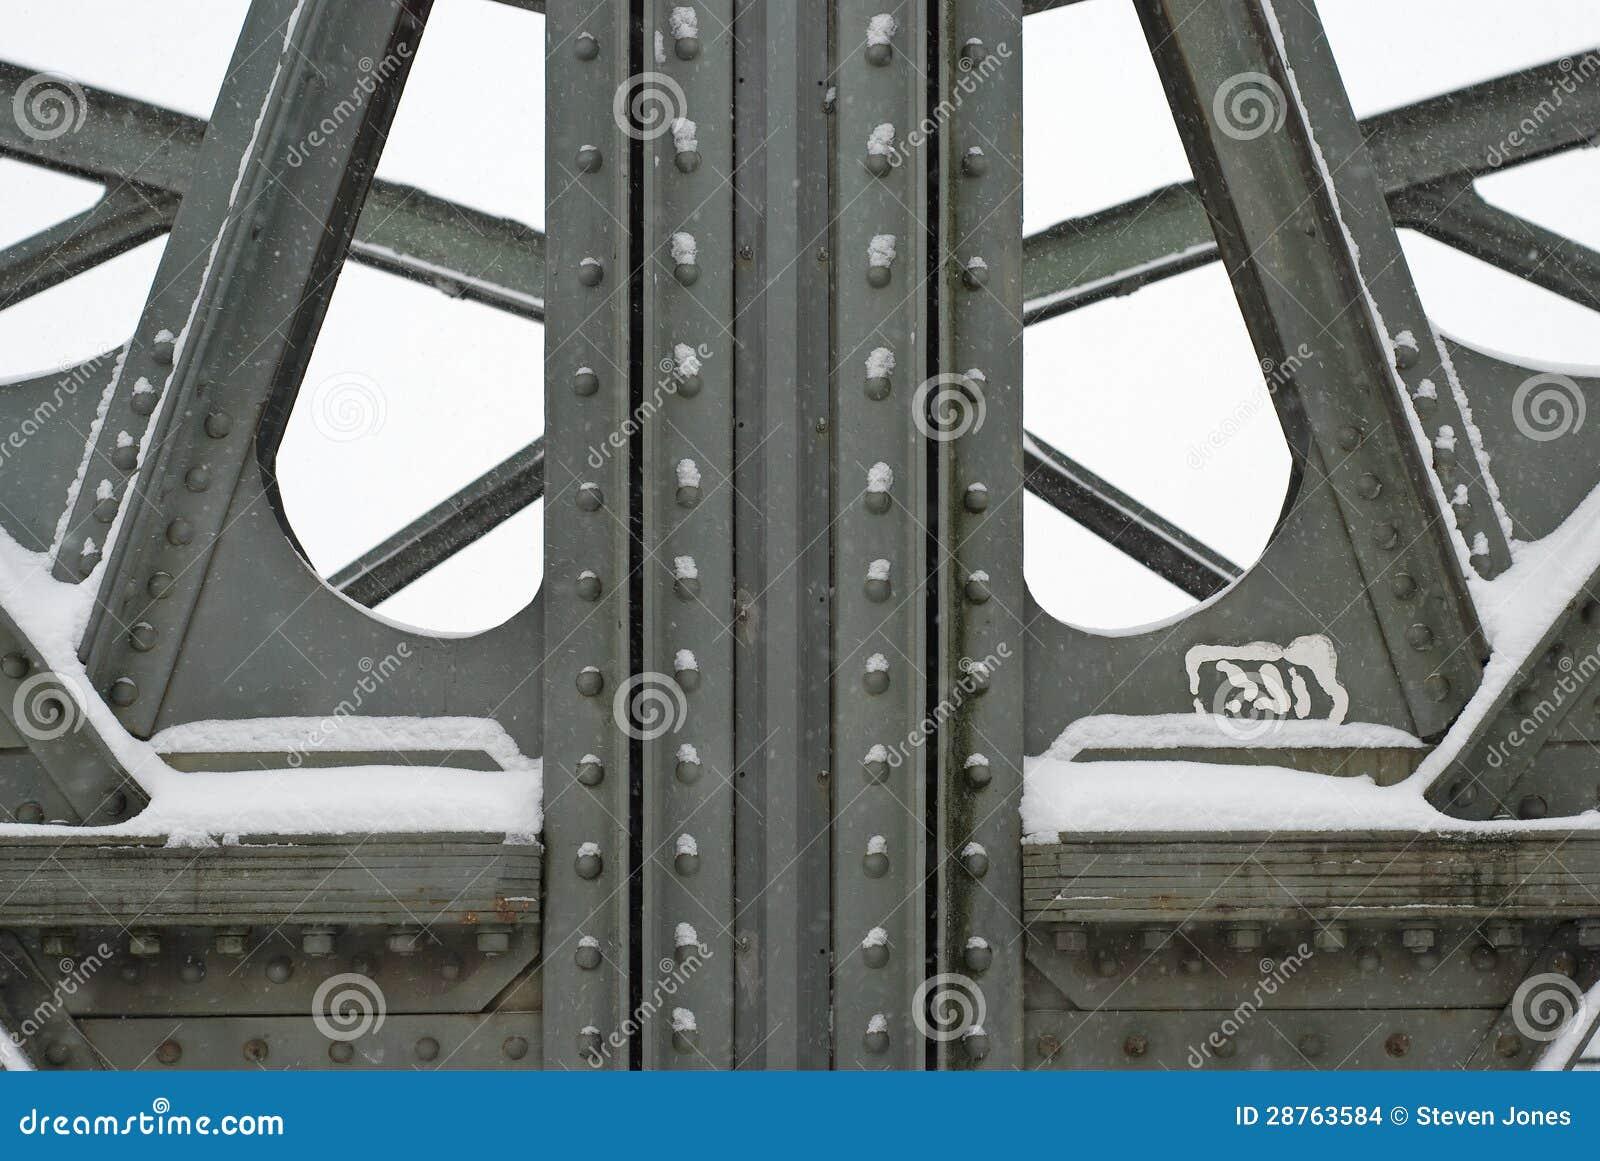 Image Result For Steel Truss Building Plans